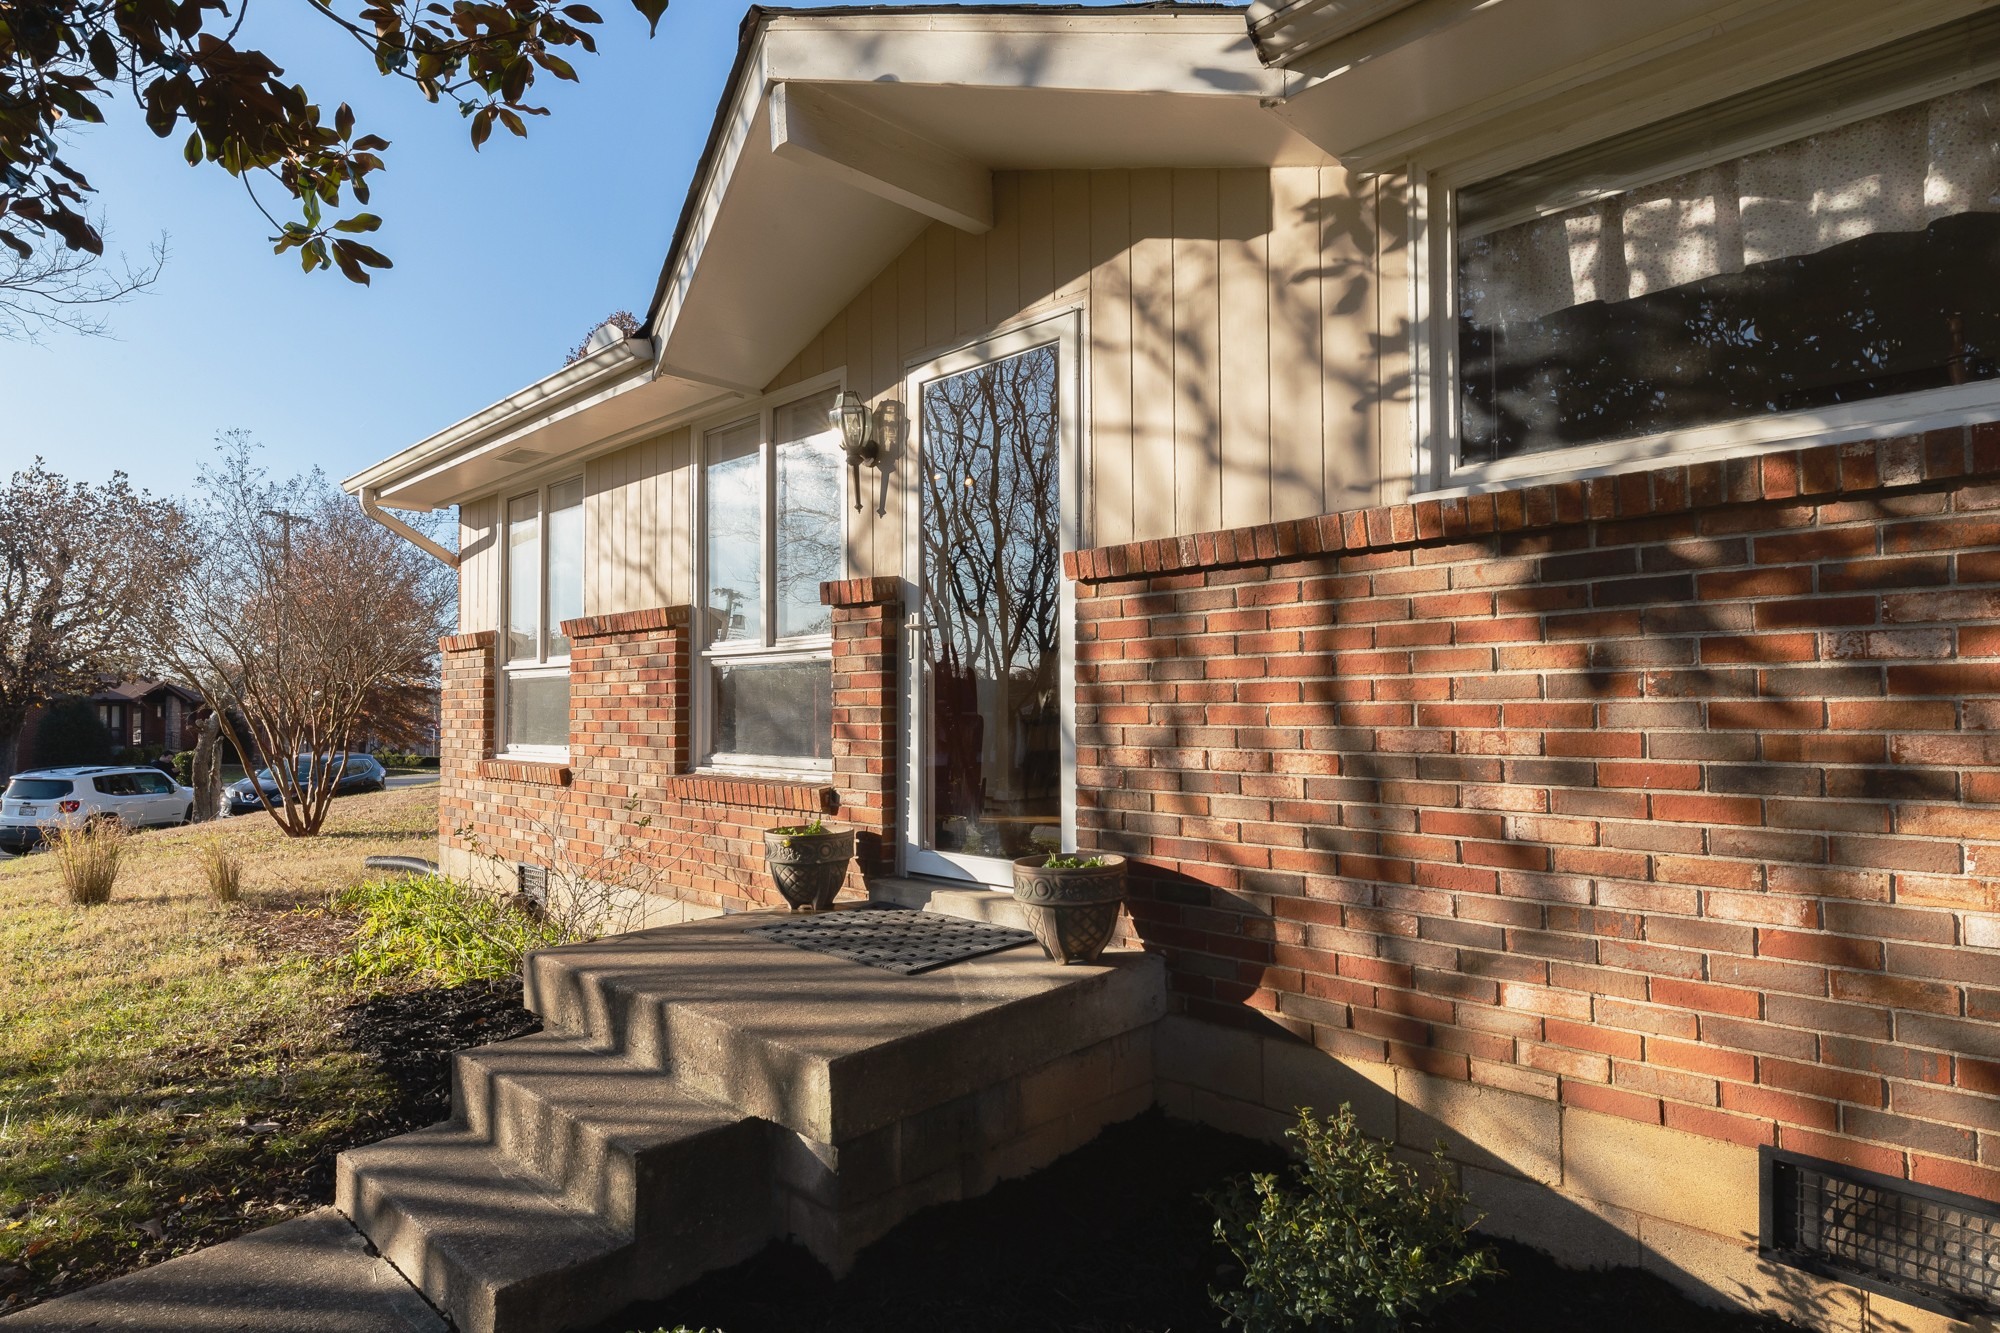 6514 Thunderbird Dr, Nashville, TN 37209 - Nashville, TN real estate listing